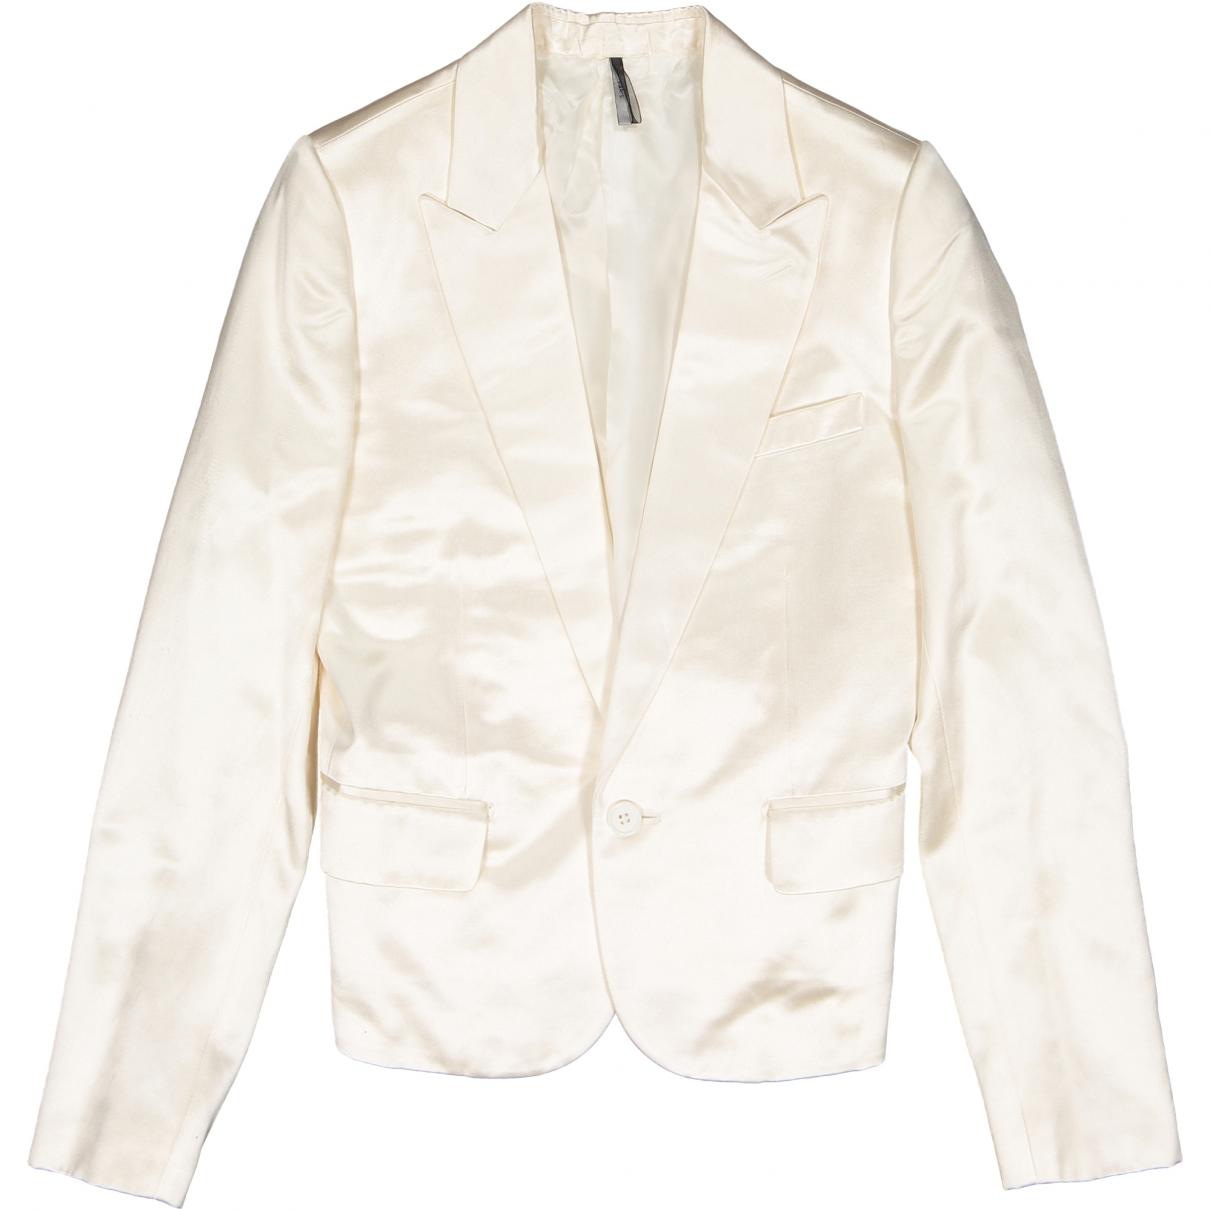 Dior \N Ecru Cotton jacket for Women 40 FR